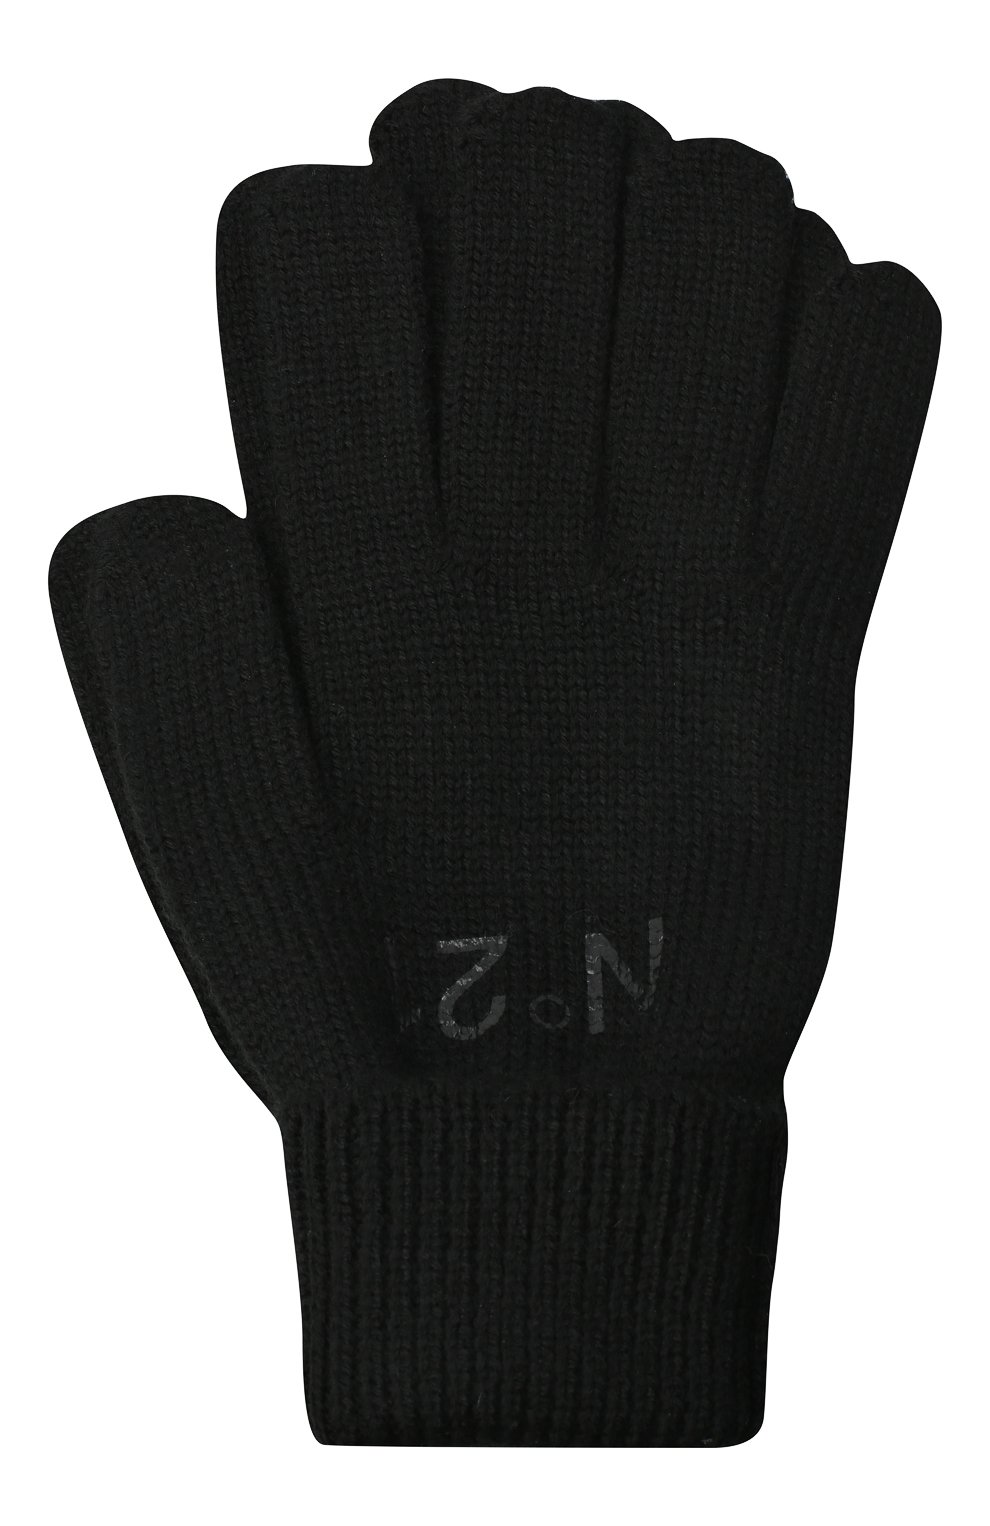 Детские перчатки N21 черного цвета, арт. N214DY/N0117/N21N3U   Фото 1